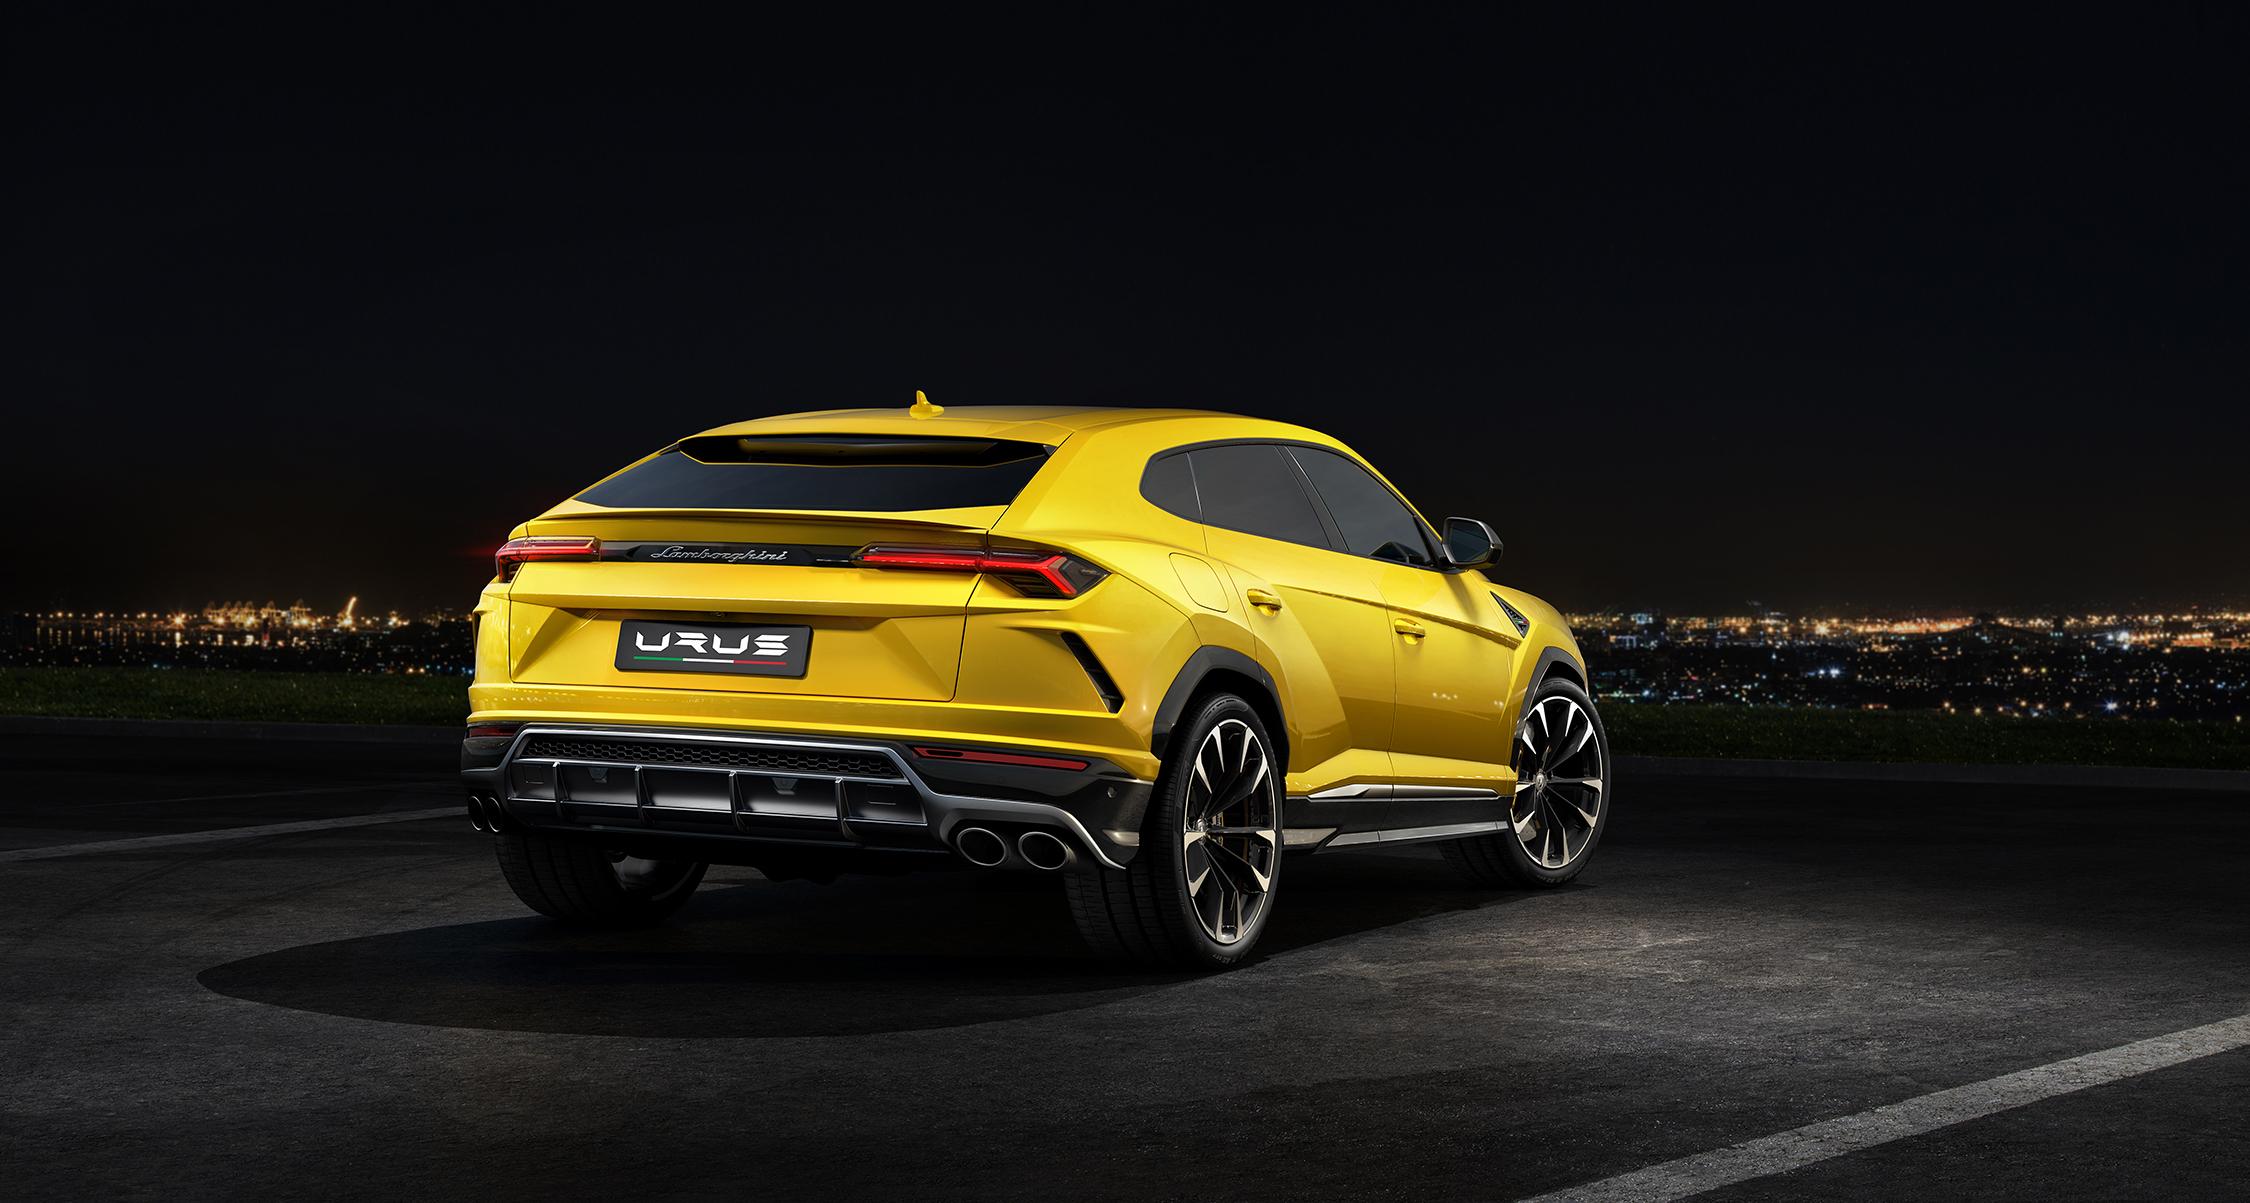 Dallas Hosts Launch Of New Lamborghini Urus